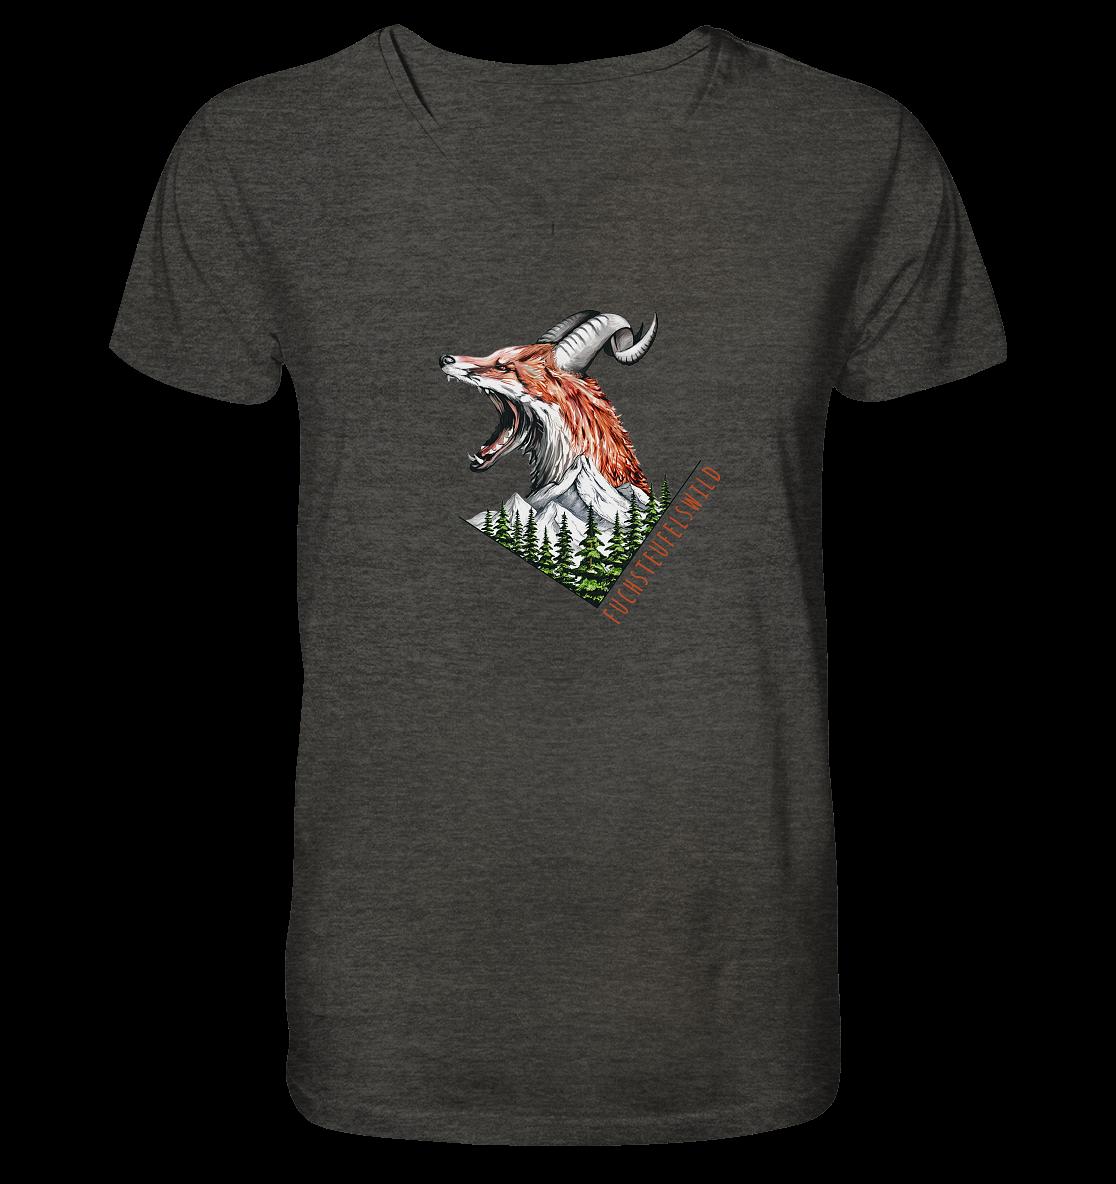 front-mens-organic-v-neck-shirt-252625-1116x-1.png